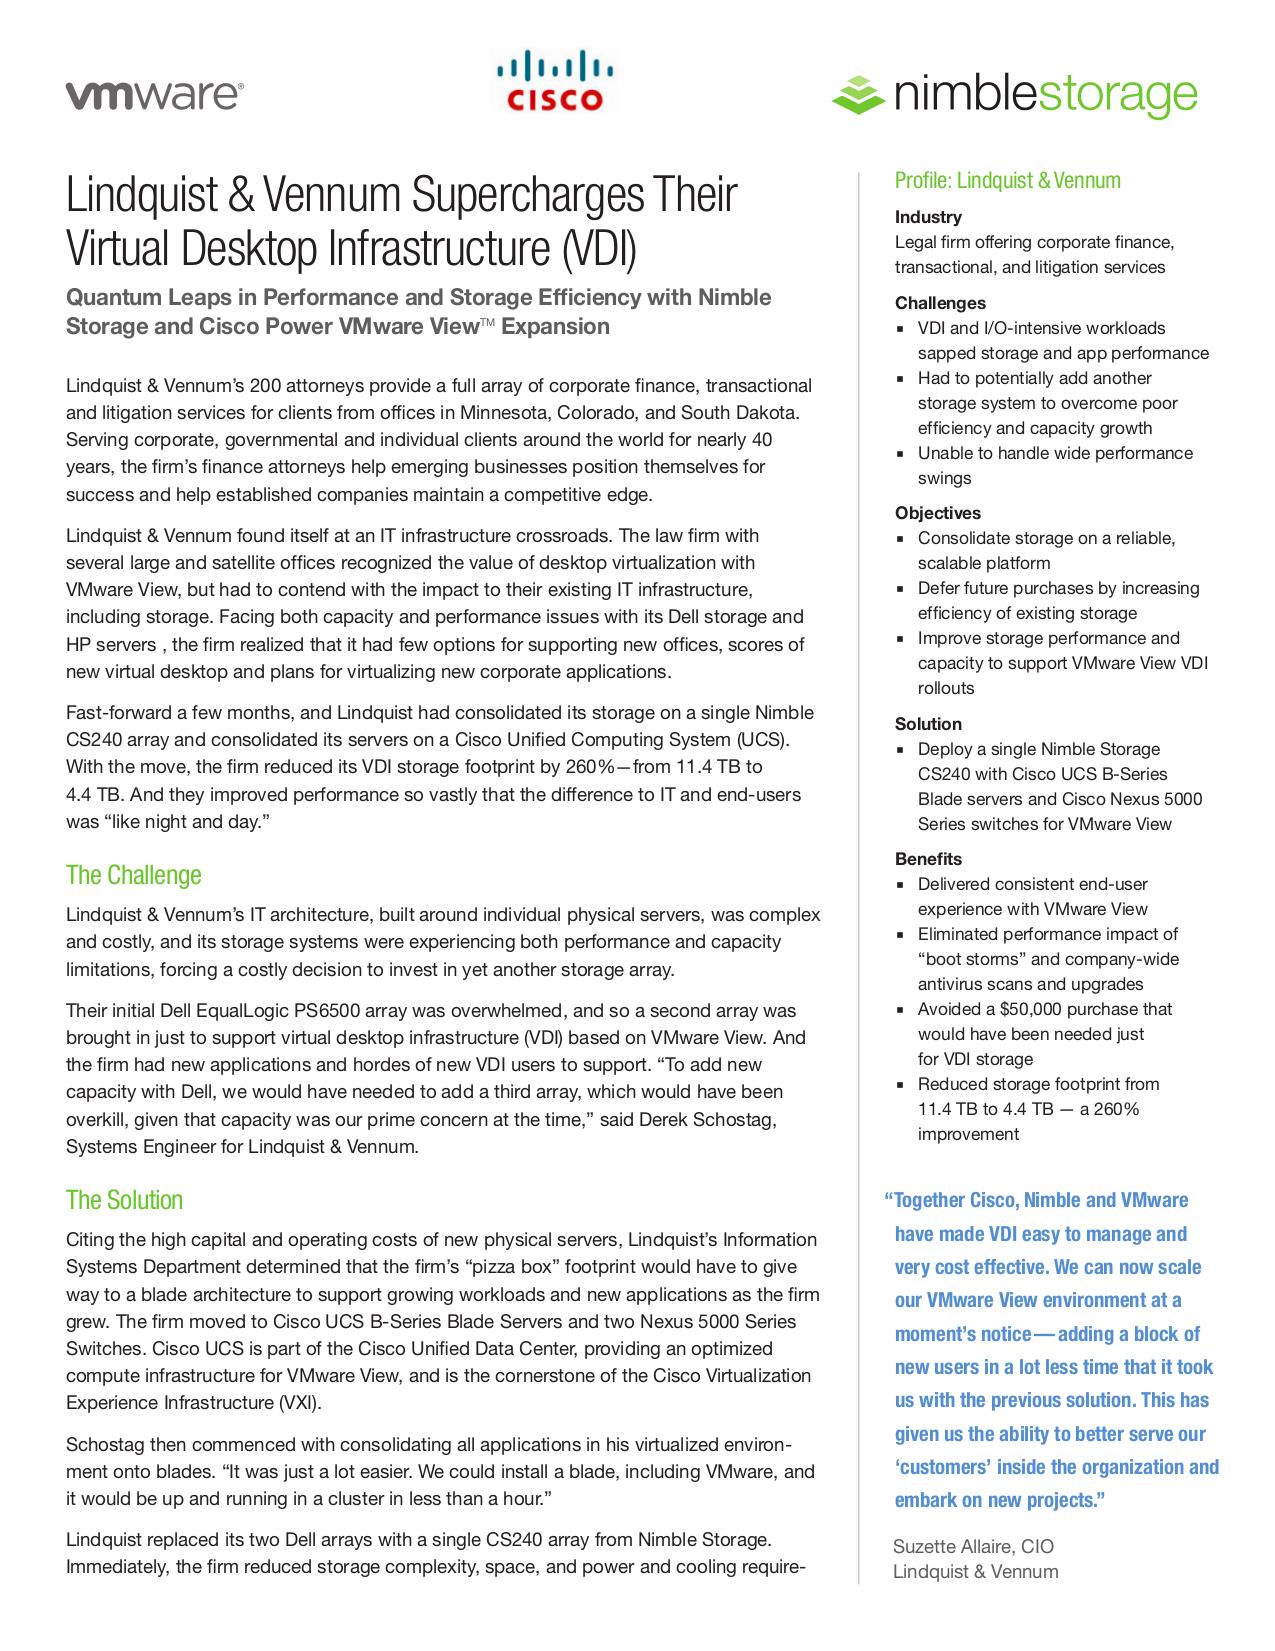 pdf for Quantum Storage DAT 432 manual